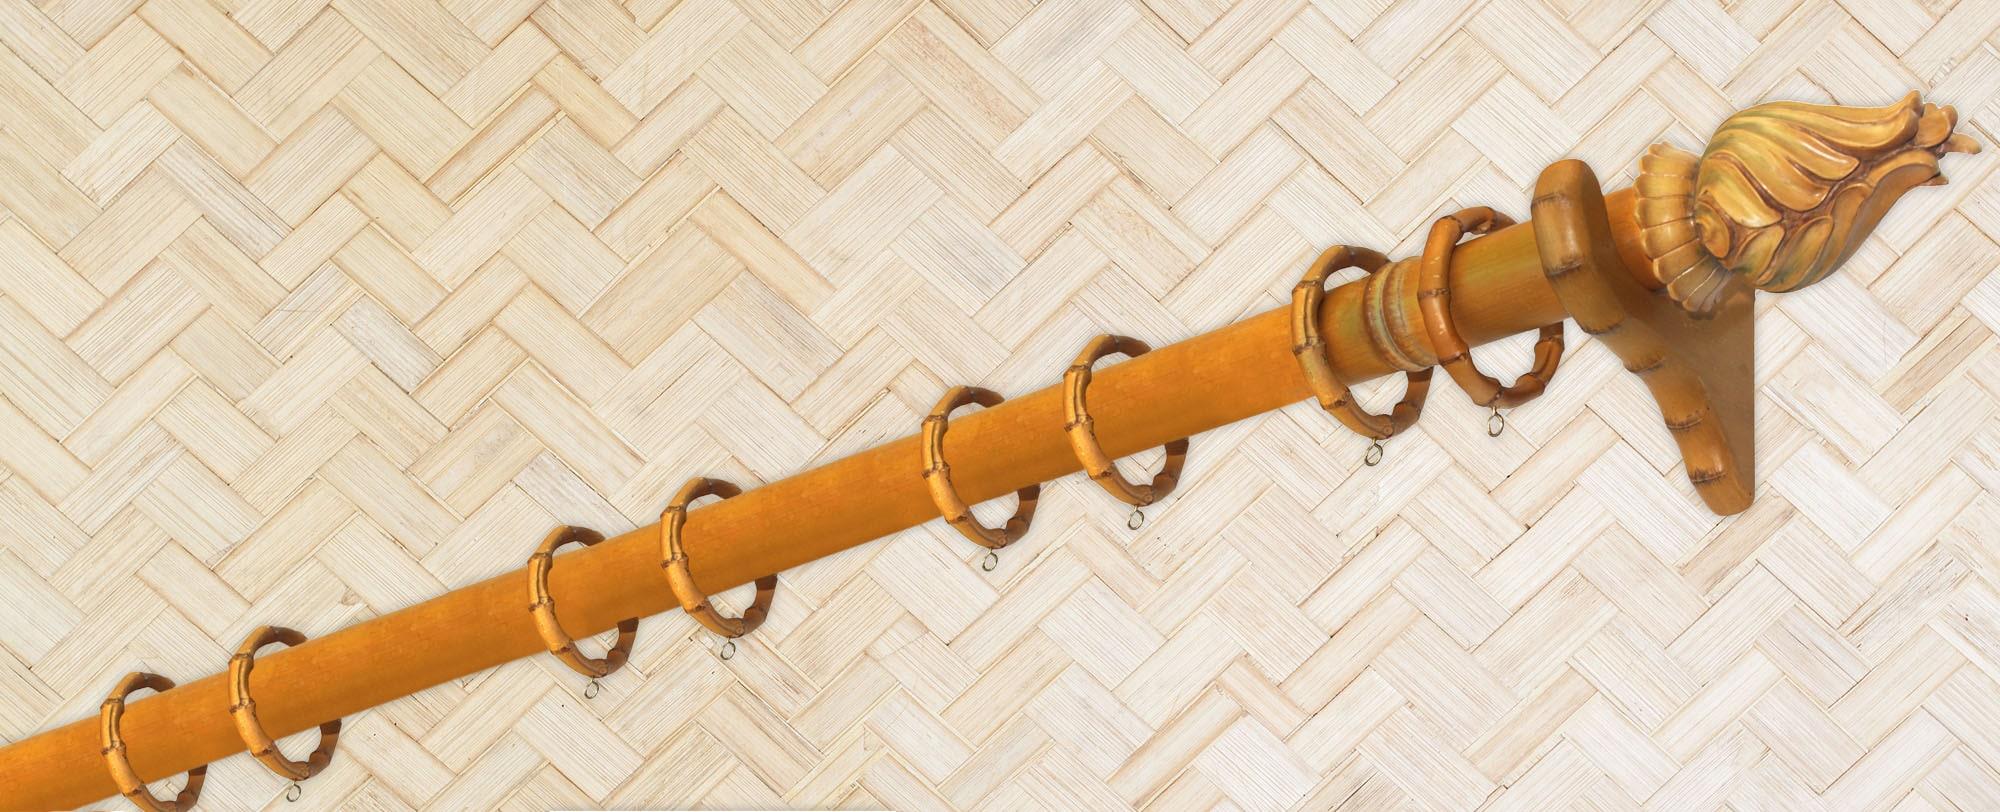 Bamboo Design Hardware Product Line